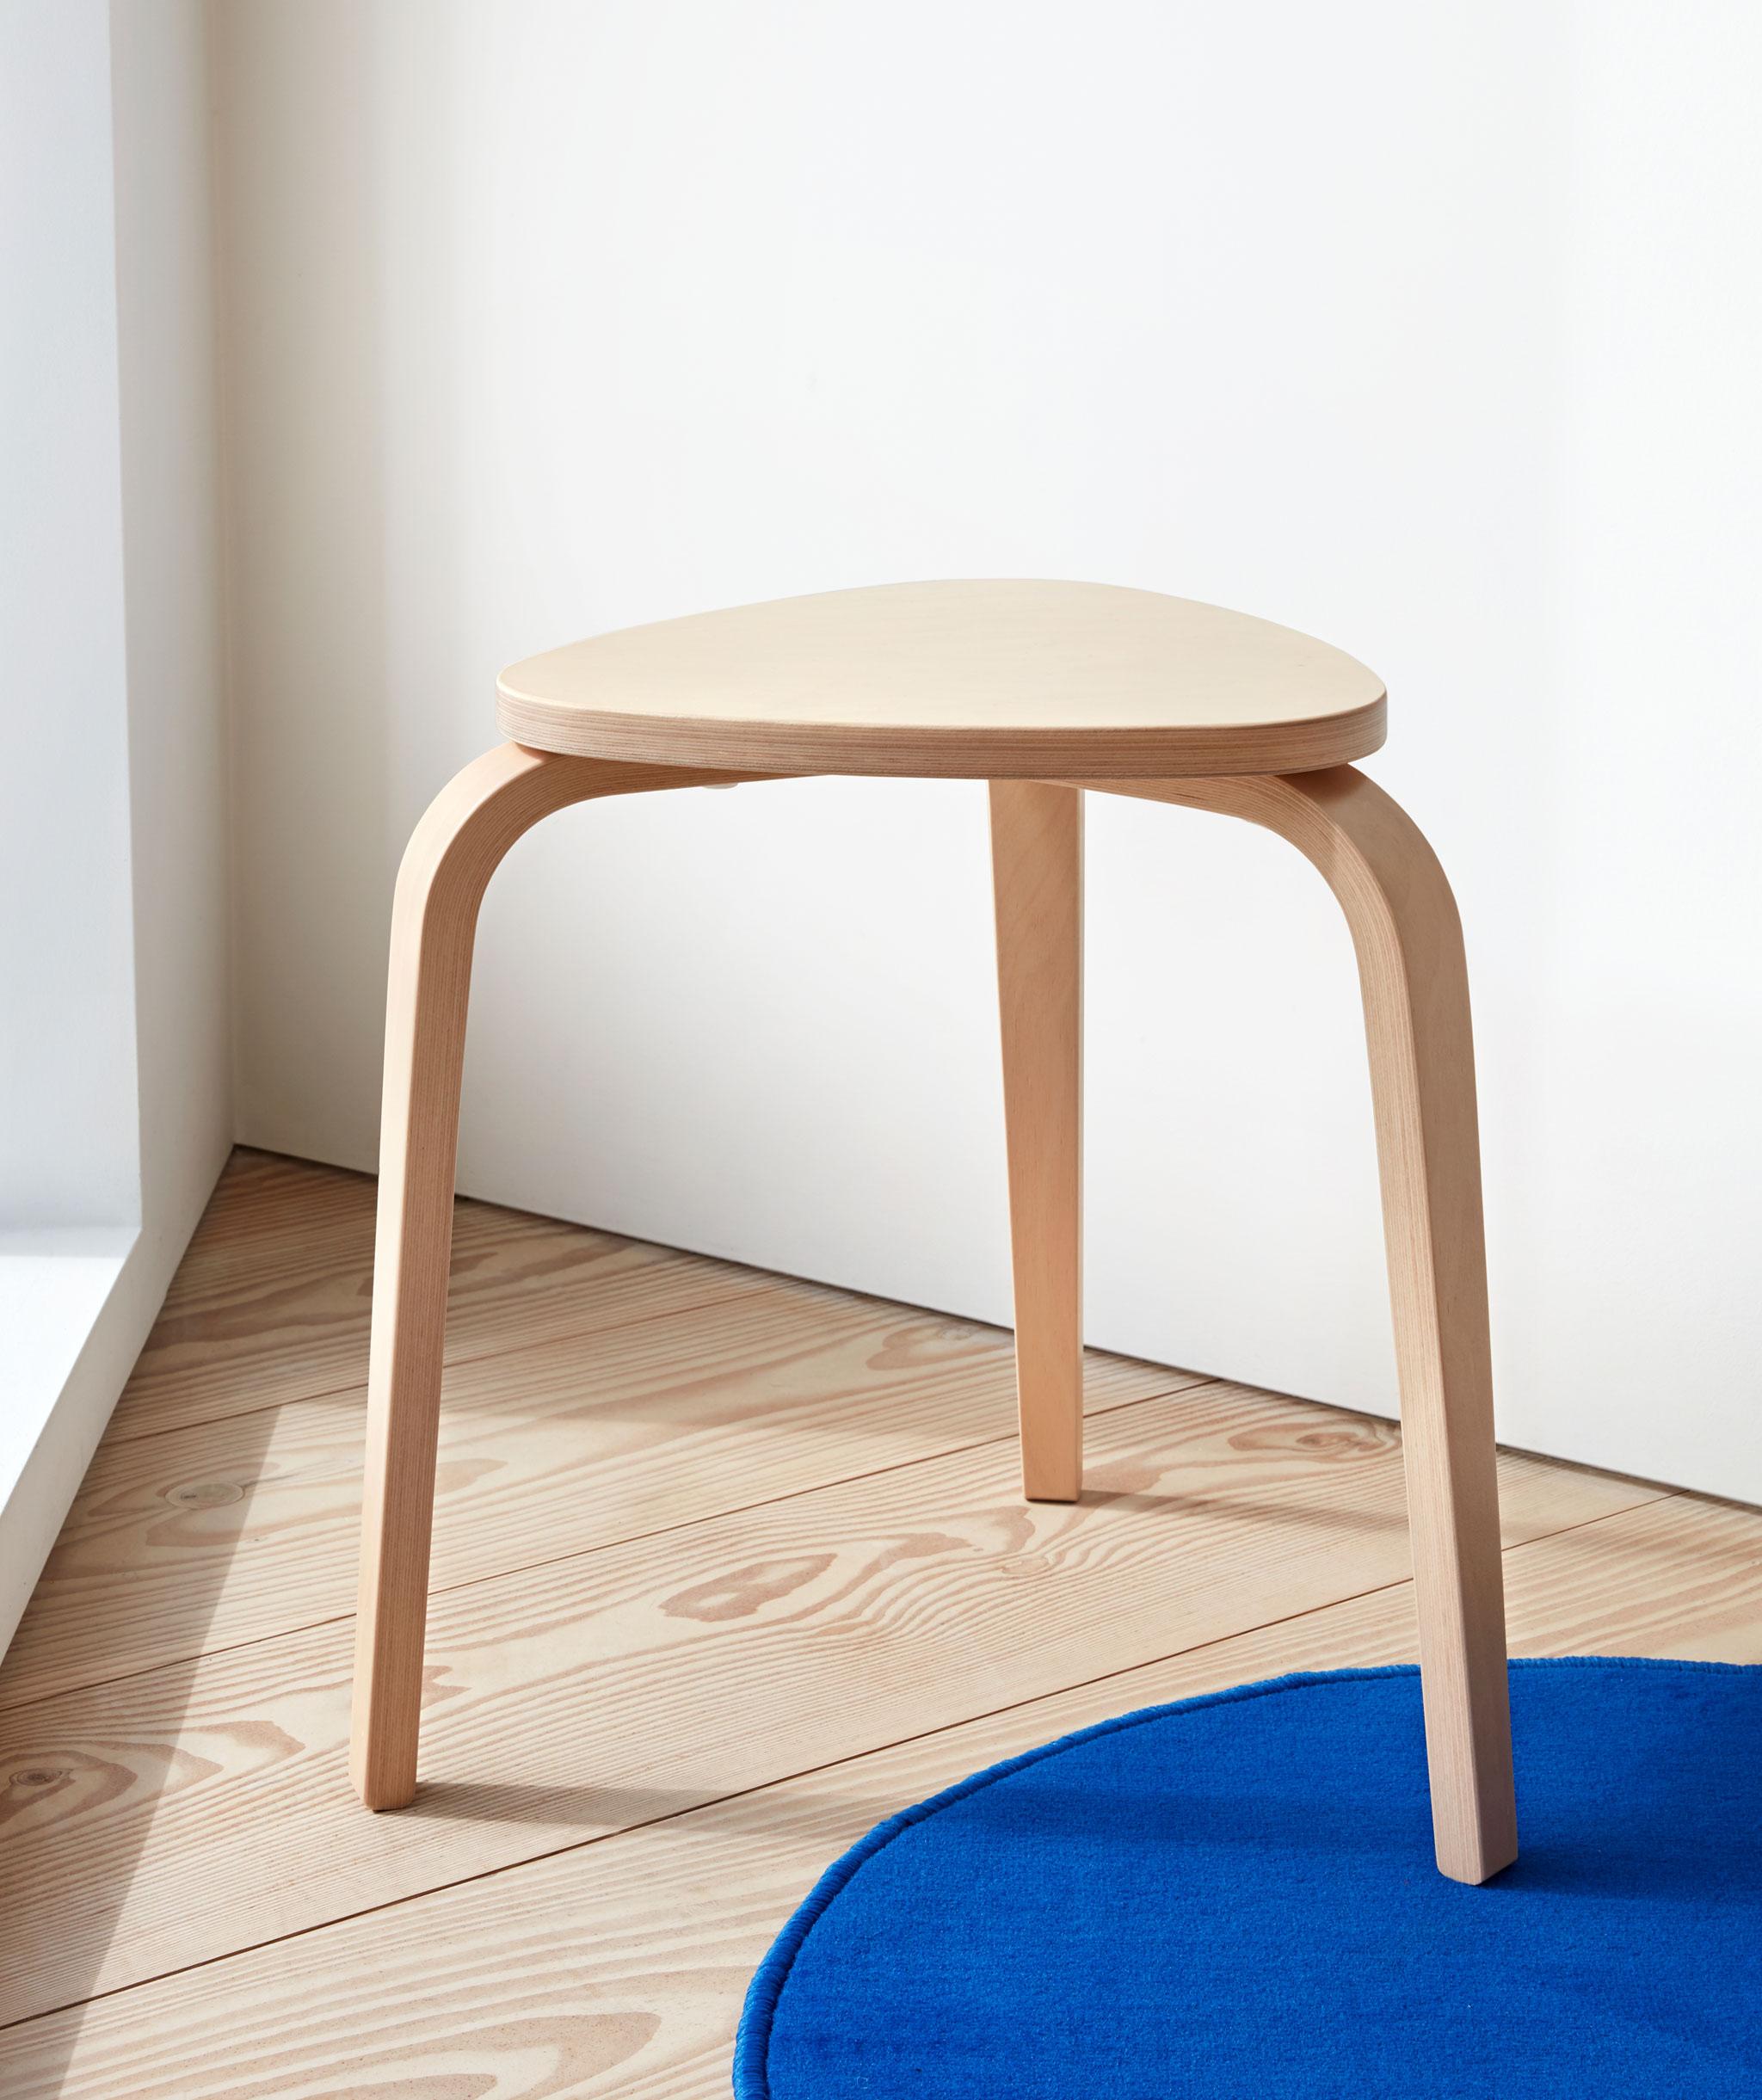 Kursi kayu ringan berkaki tiga berdiri di area sudut dengan lantai kayu, satu kaki berada di karpet biru kecil.